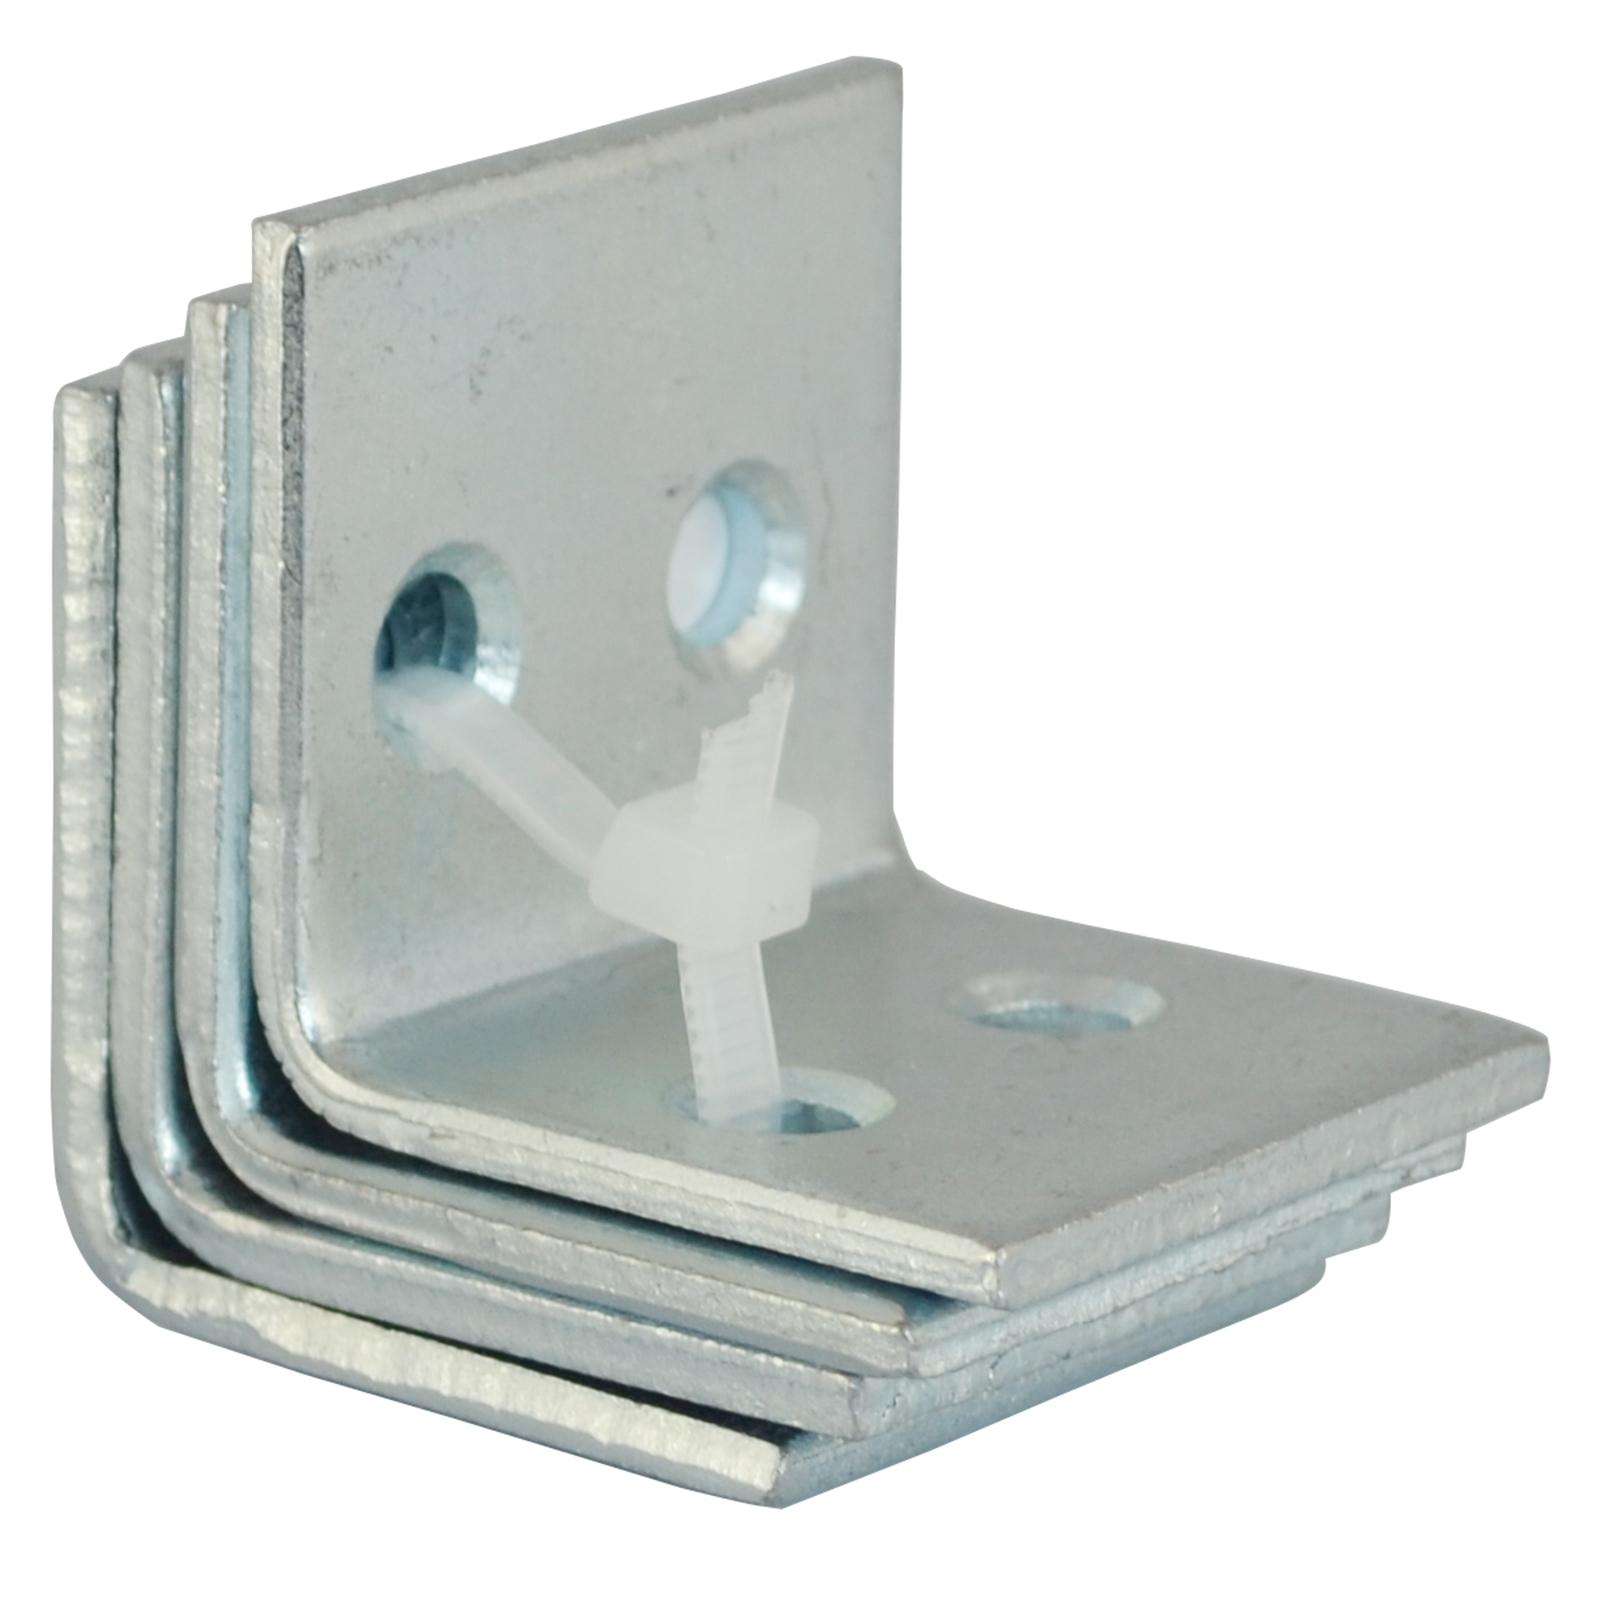 Carinya 40 x 40 x 40 x 3.5mm Zinc Plated Angle Bracket - 4 Pack